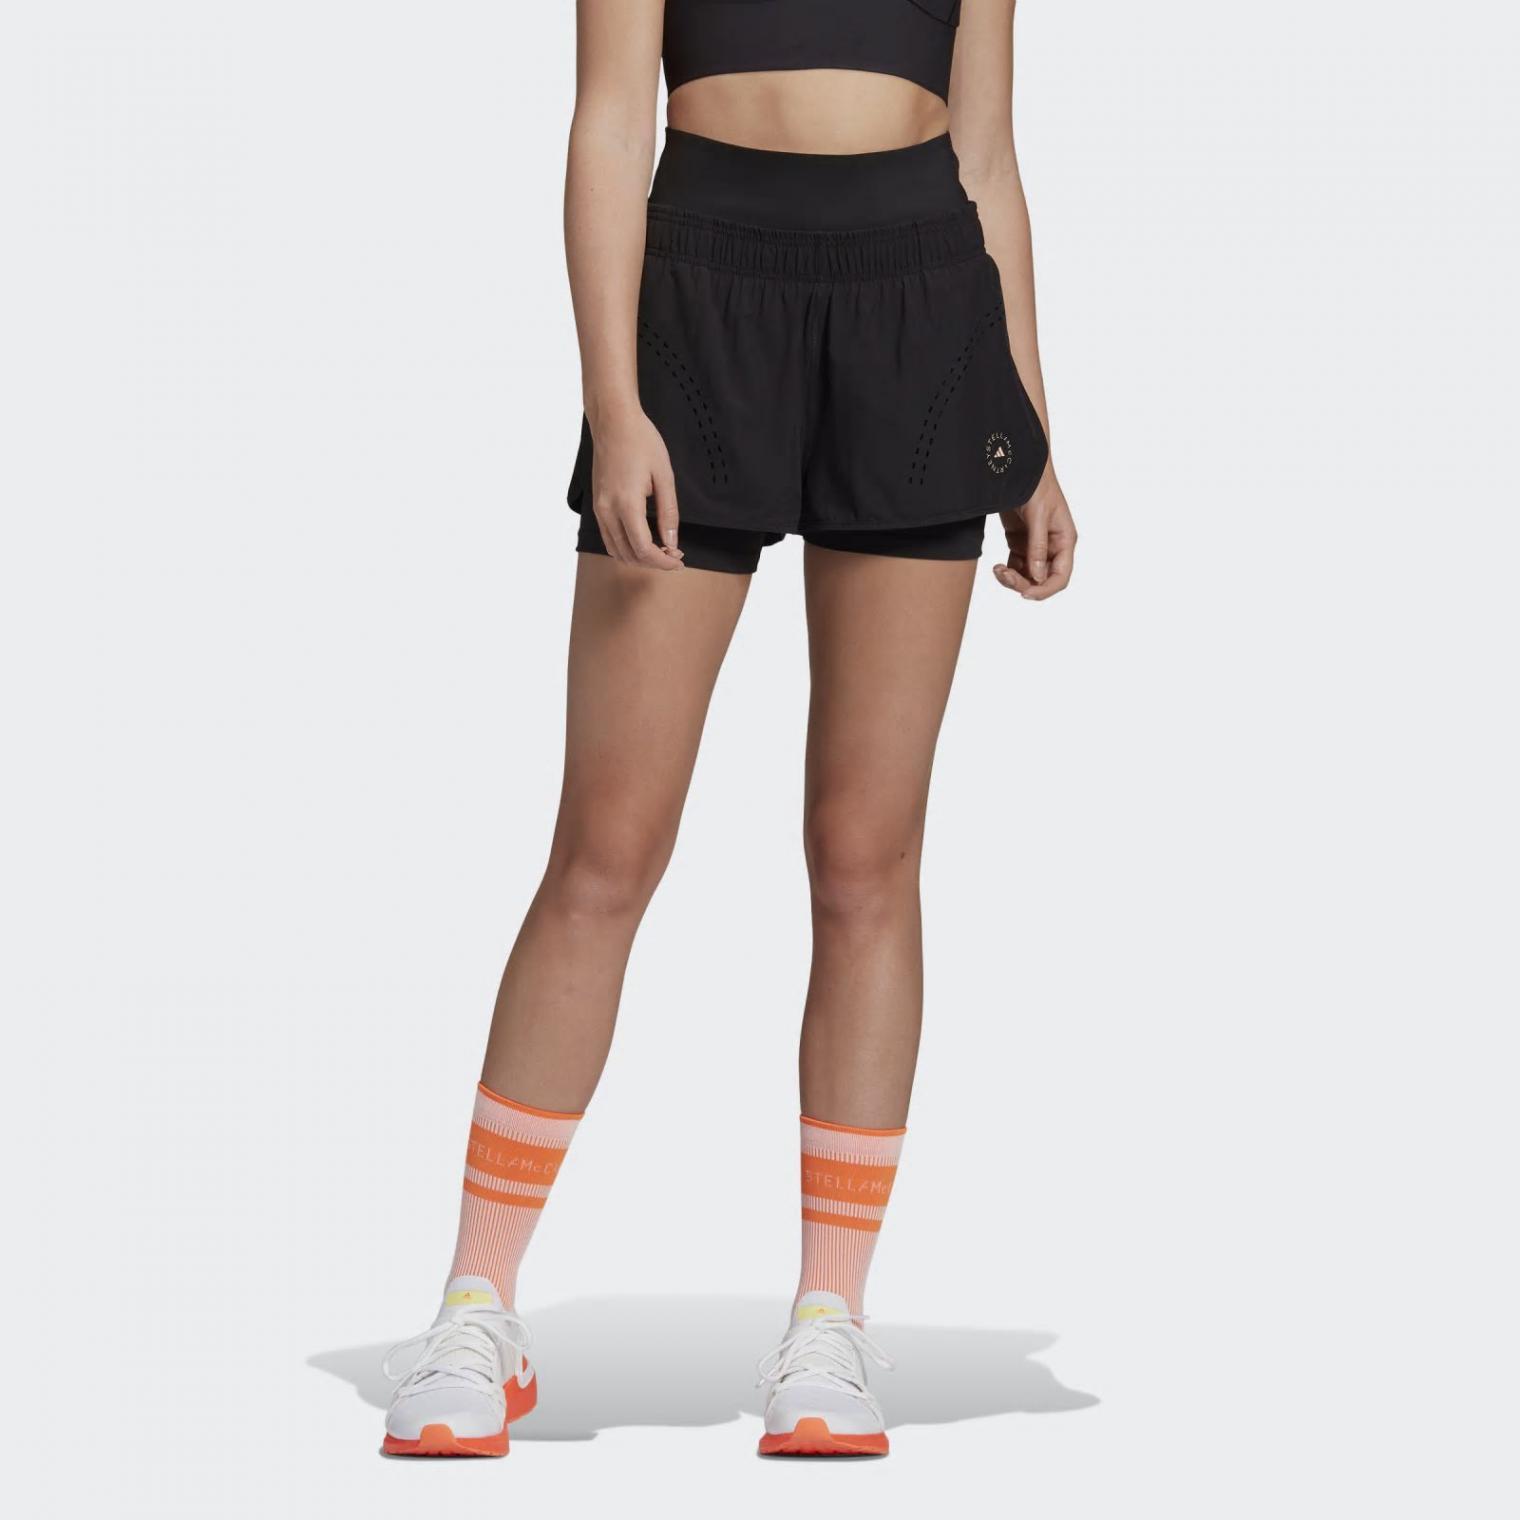 Pantalon Corto Adidas By Stella Mccartney Truepurpose High Intensity Black Pantalones Cortos Adidas Mujer Starline Magicians